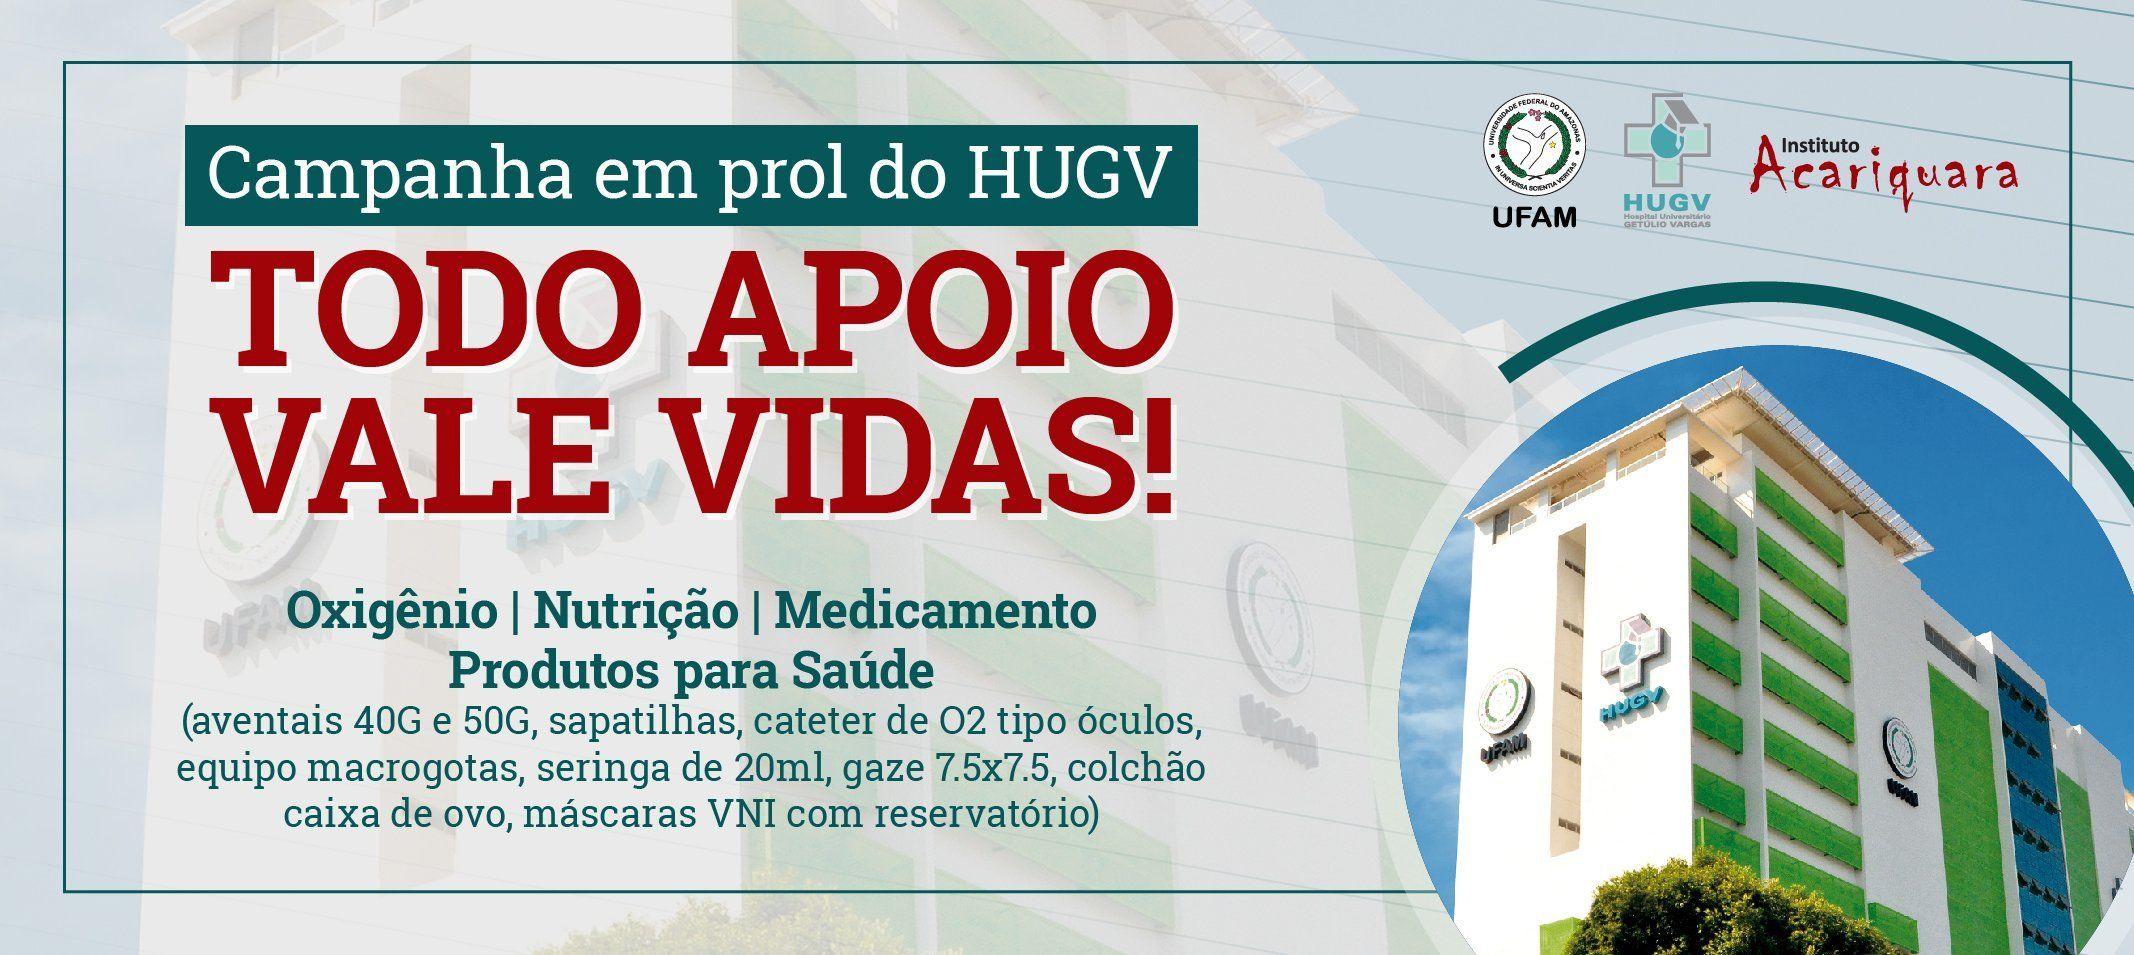 Ufam promove Campanha 'Todo Apoio Vale Vidas'